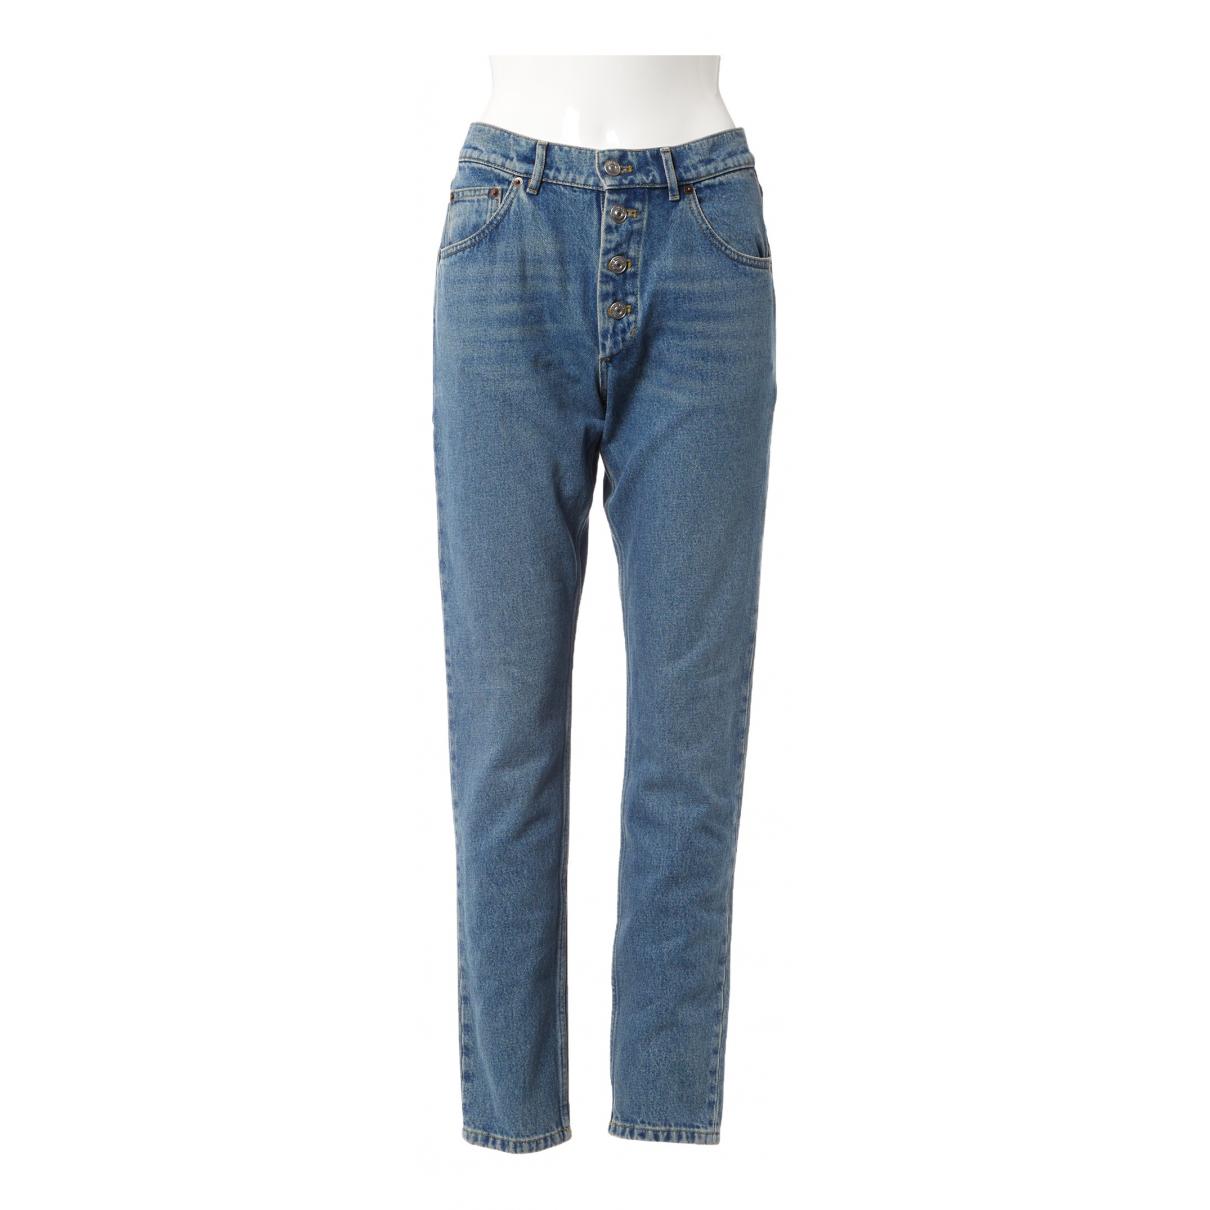 Balenciaga \N Jeans in  Blau Baumwolle